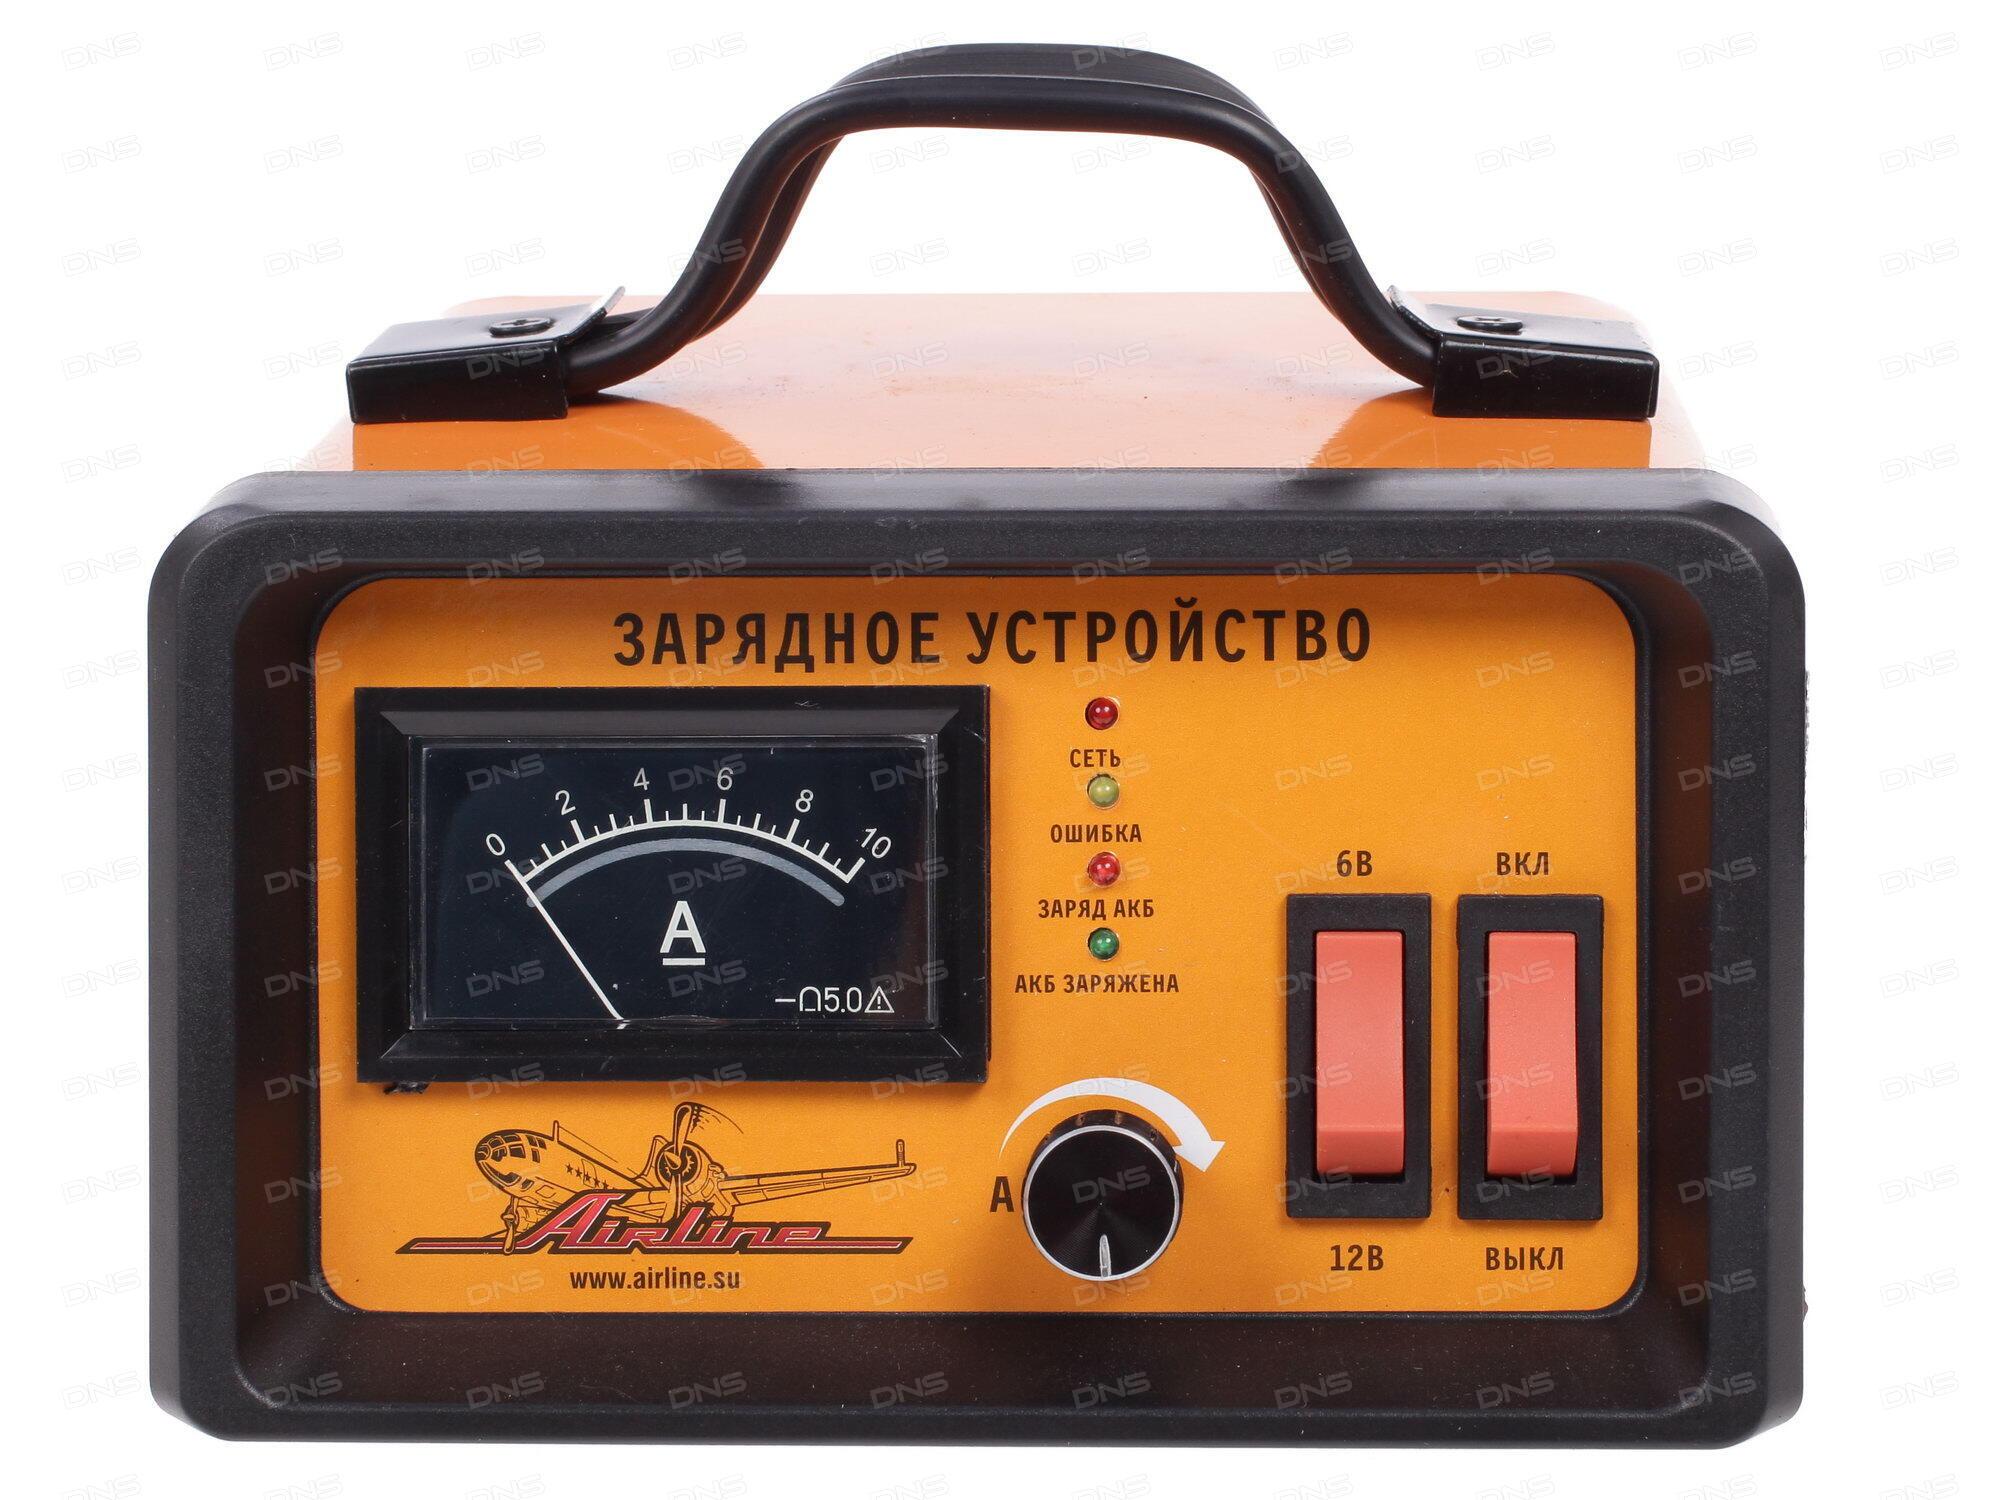 Зарядное устройство с амперметром